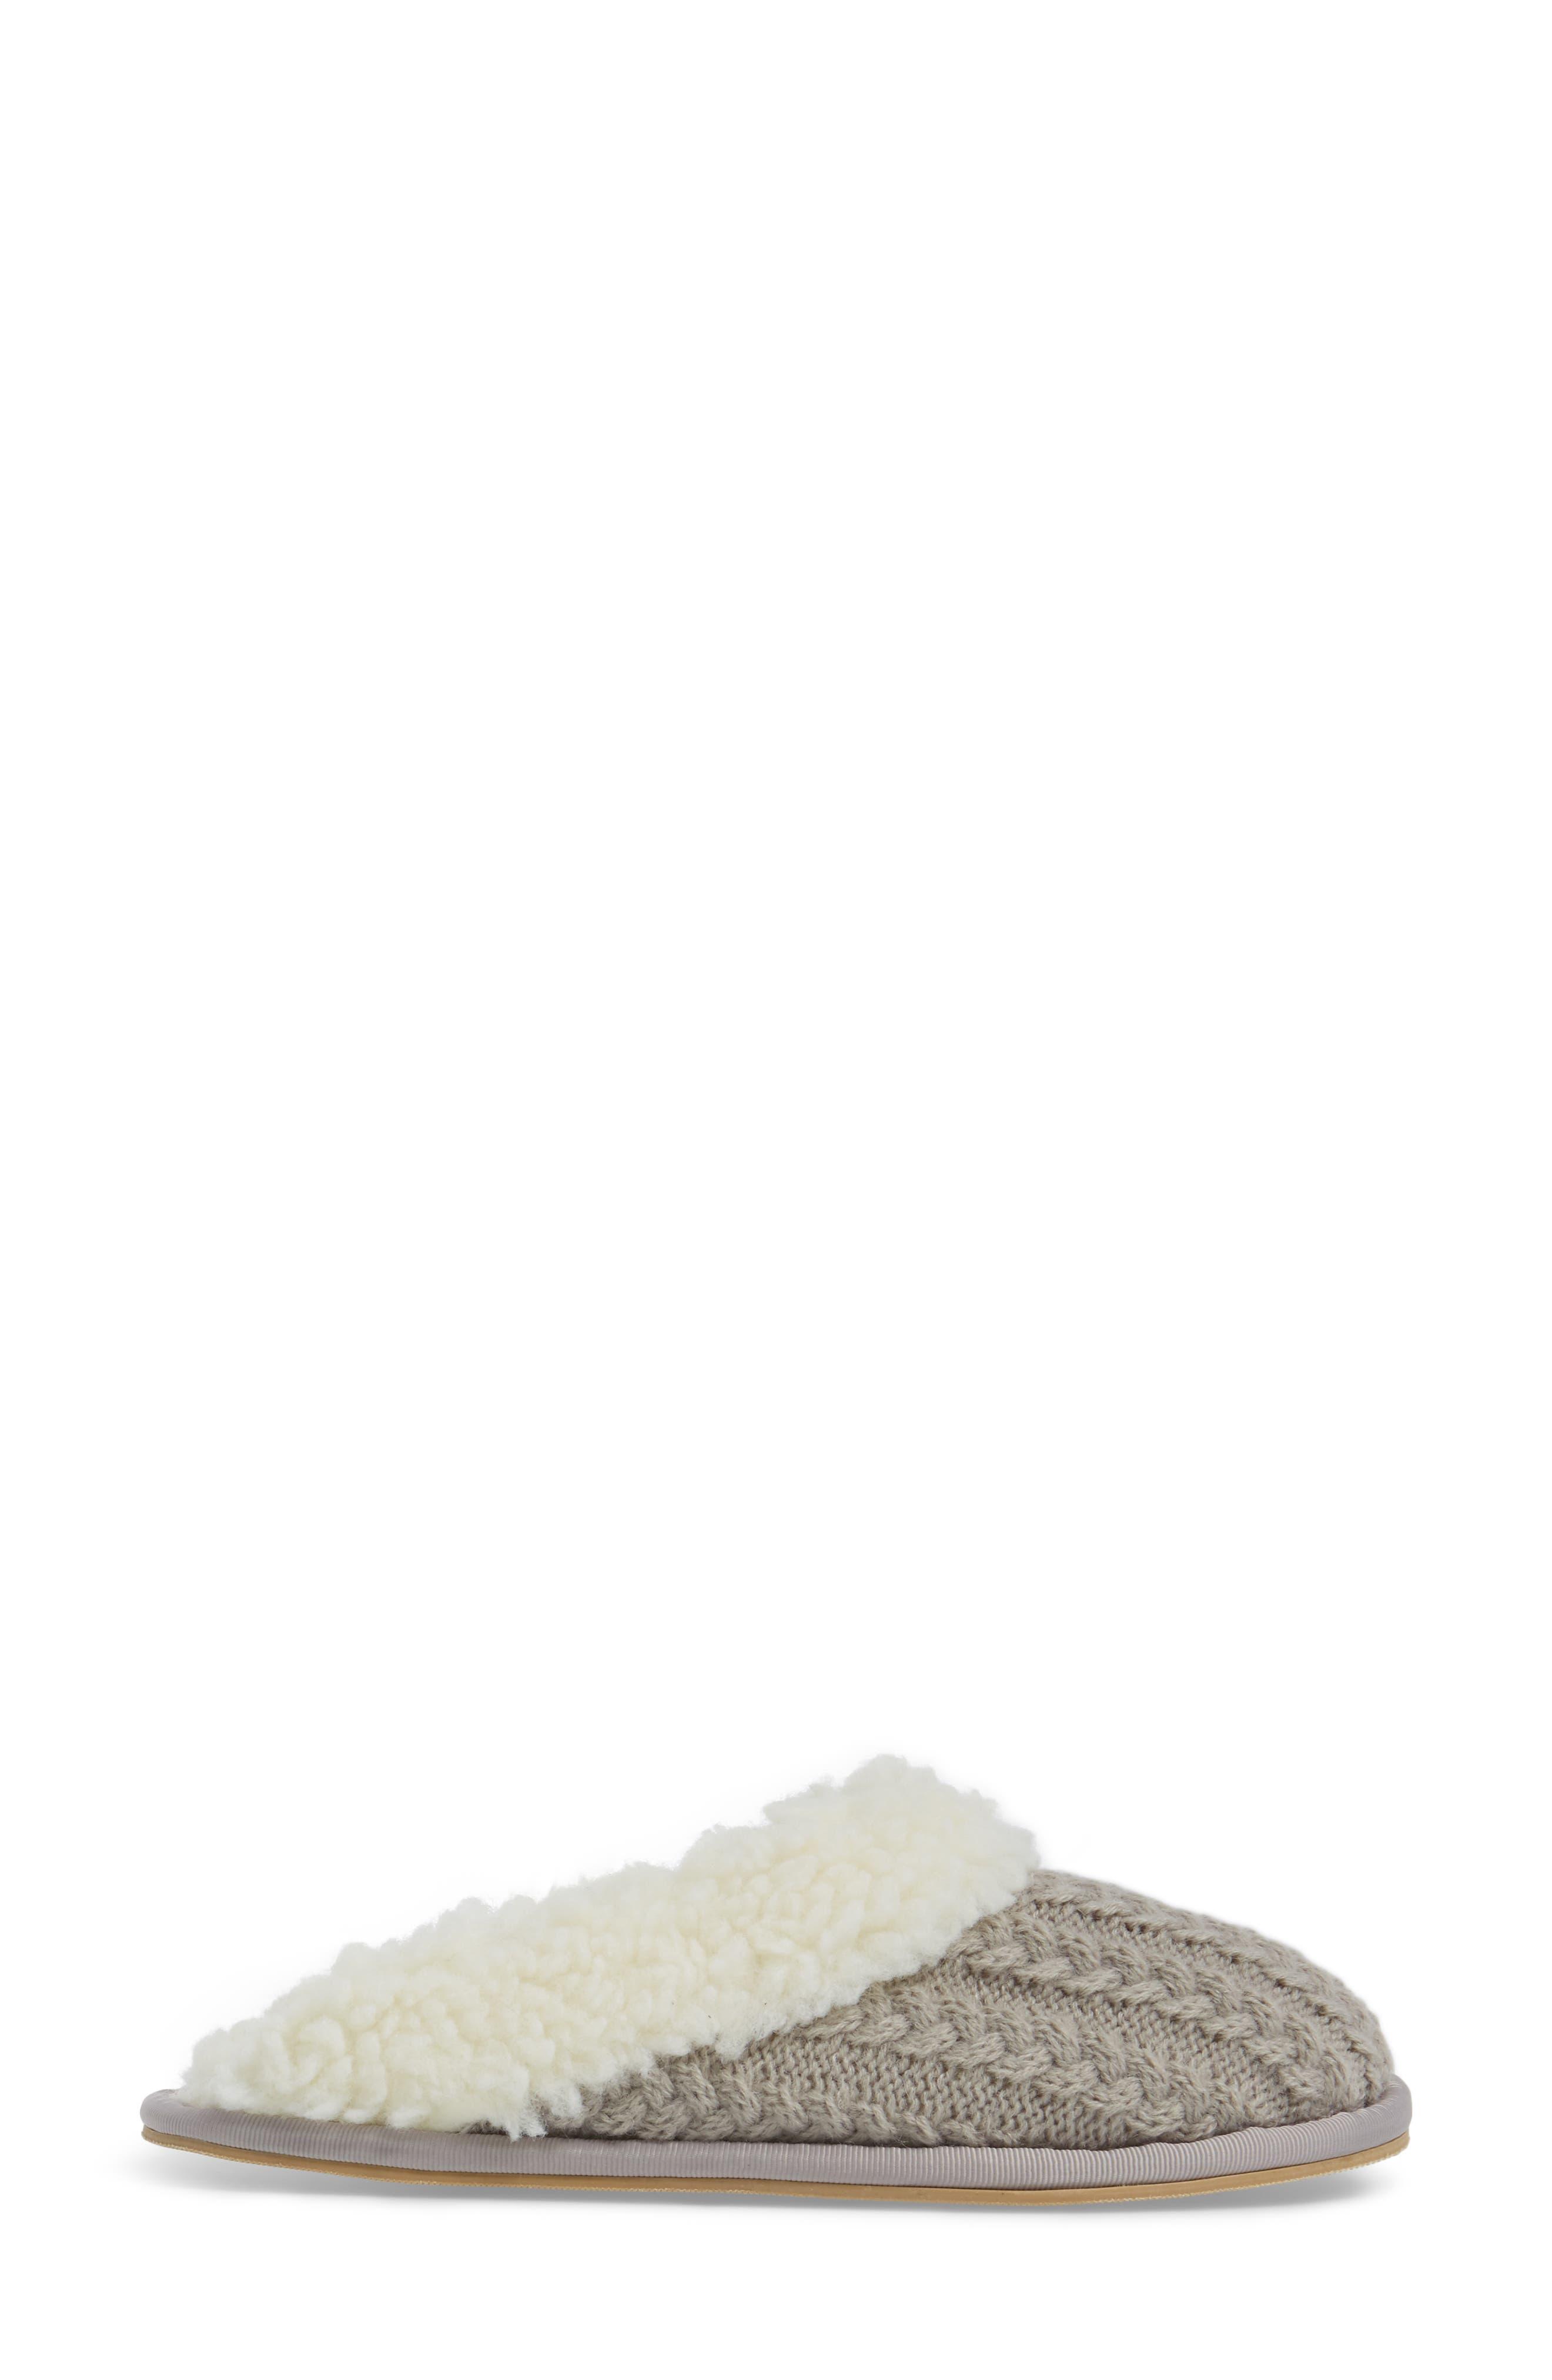 Celia Cable Knit Slipper,                             Alternate thumbnail 3, color,                             Grey Fabric